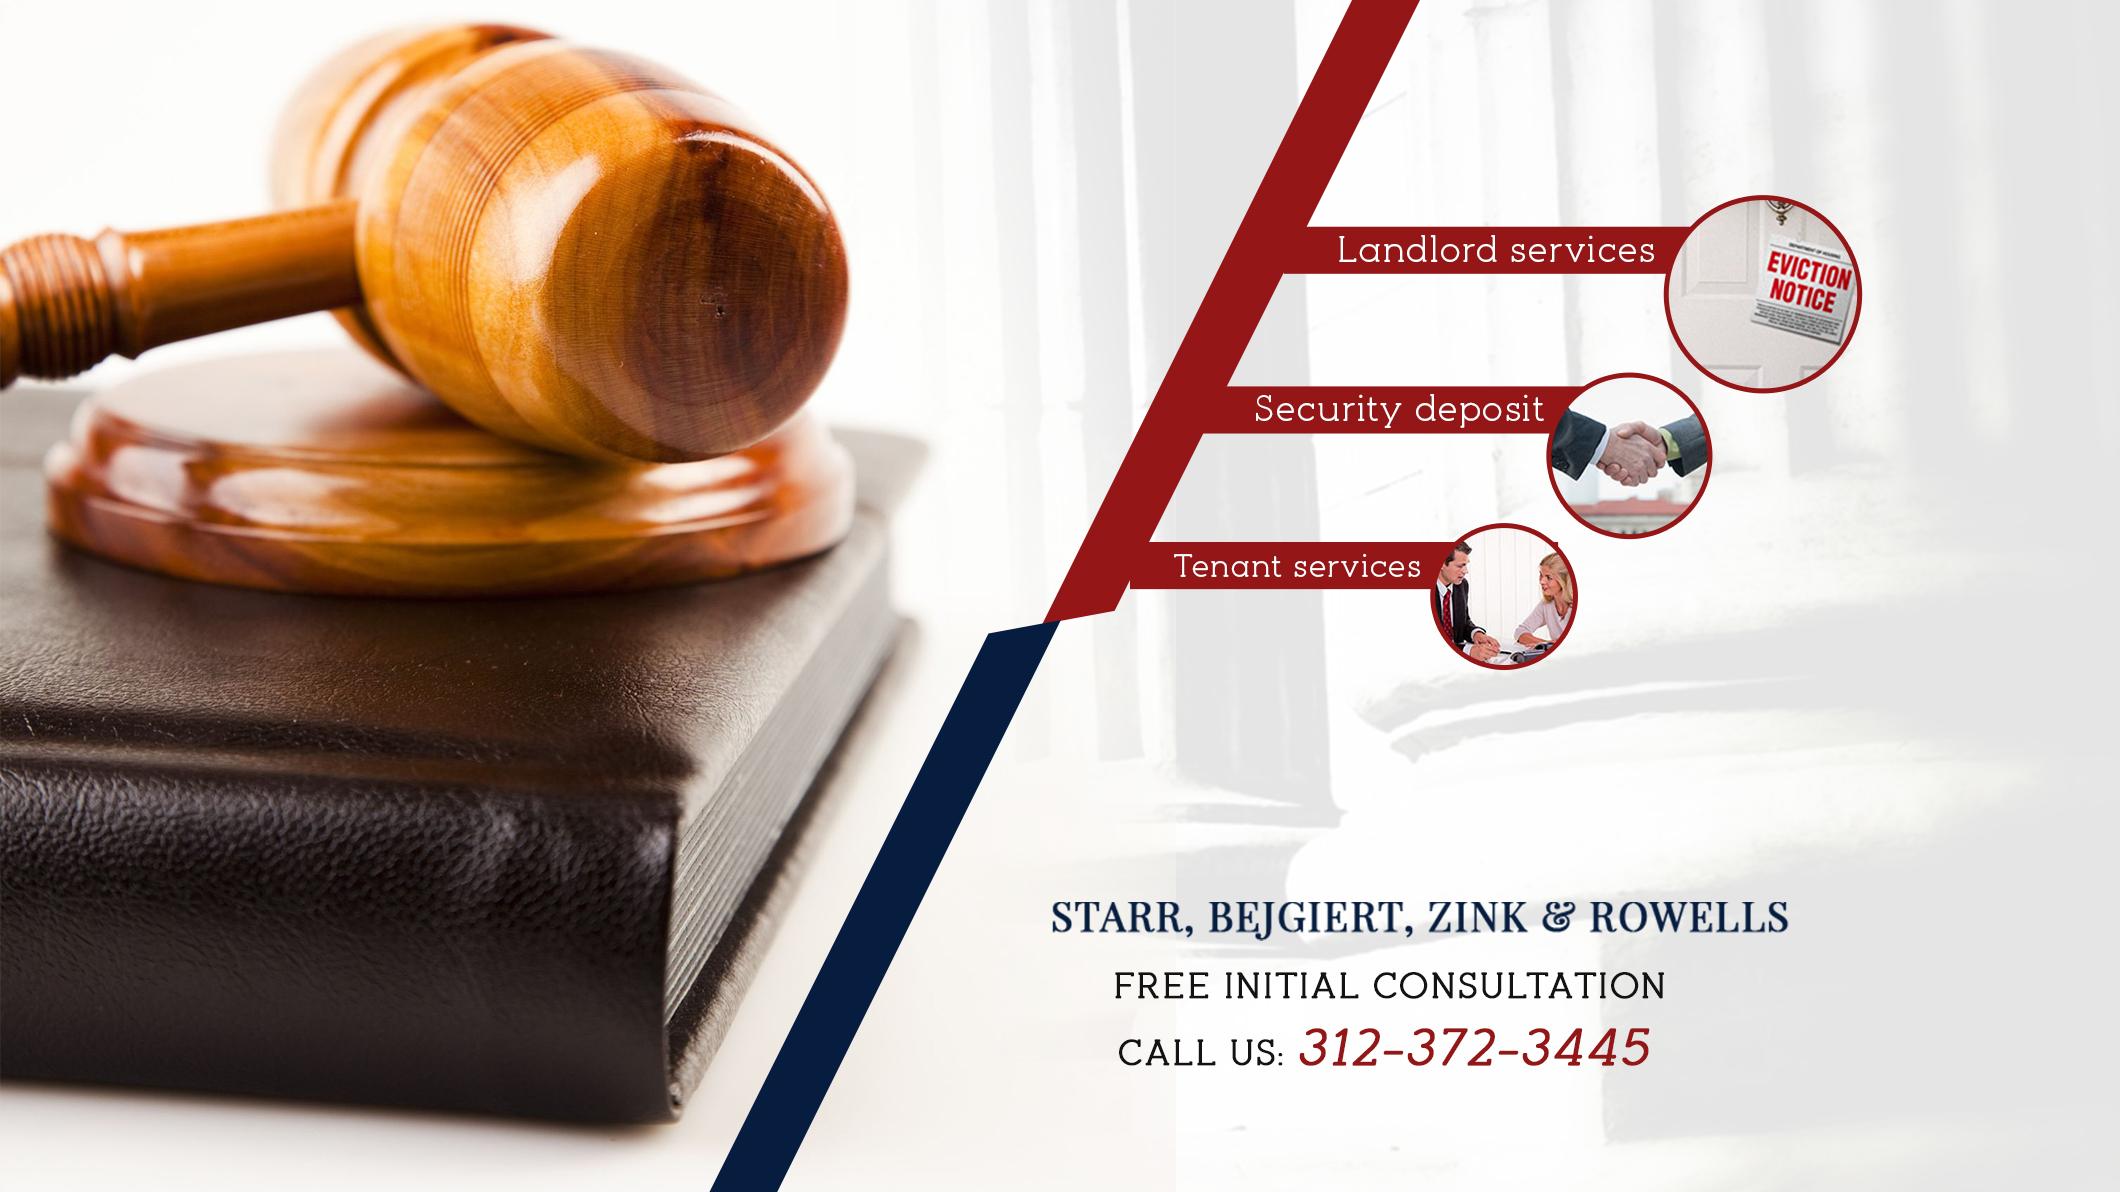 Starr, Bejgiert, Zink and Rowells lawyers